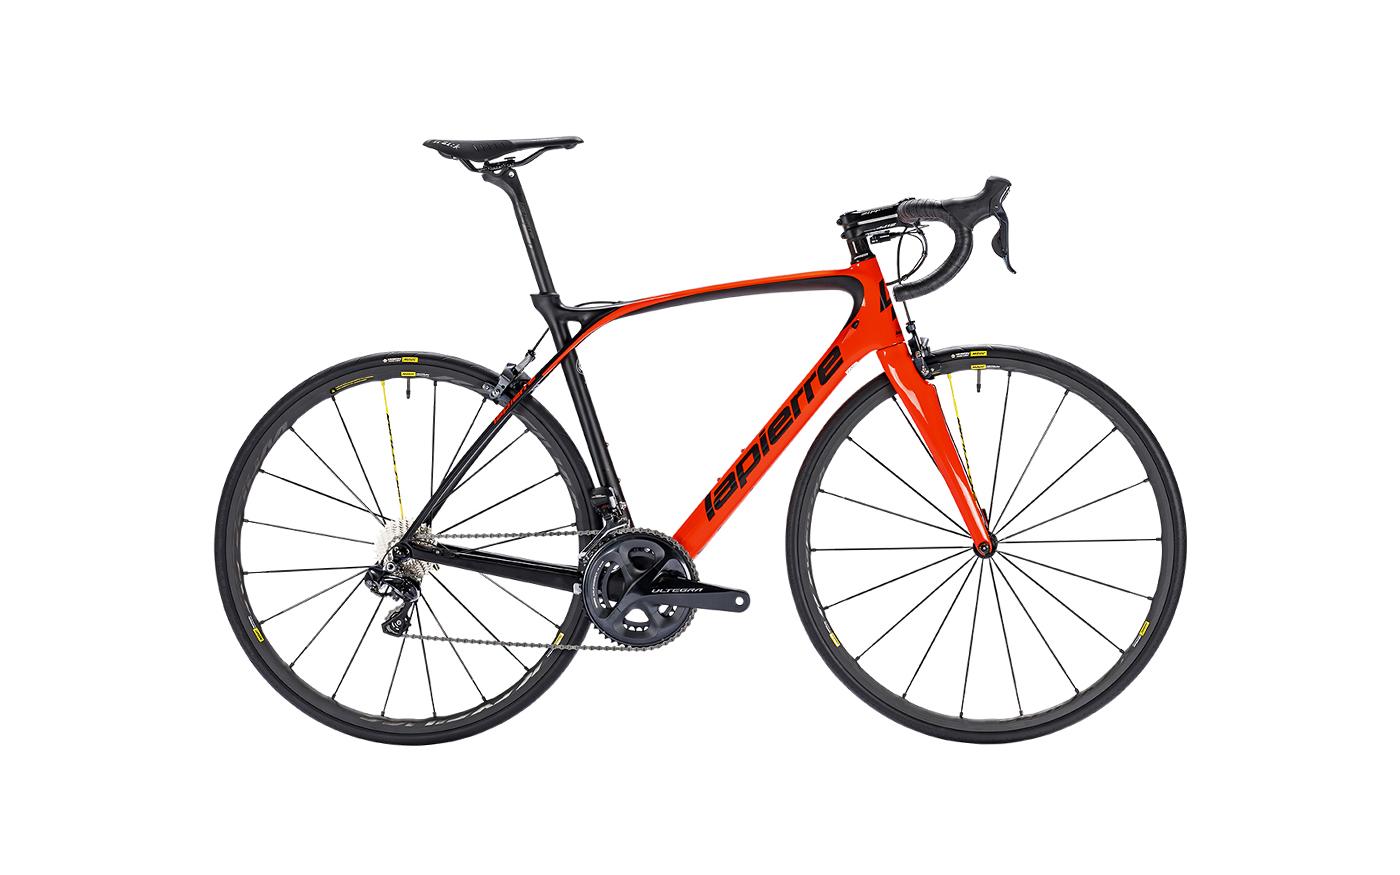 Bicykel LAPIERRE XELIUS SL 700 Ultimate CP 2018